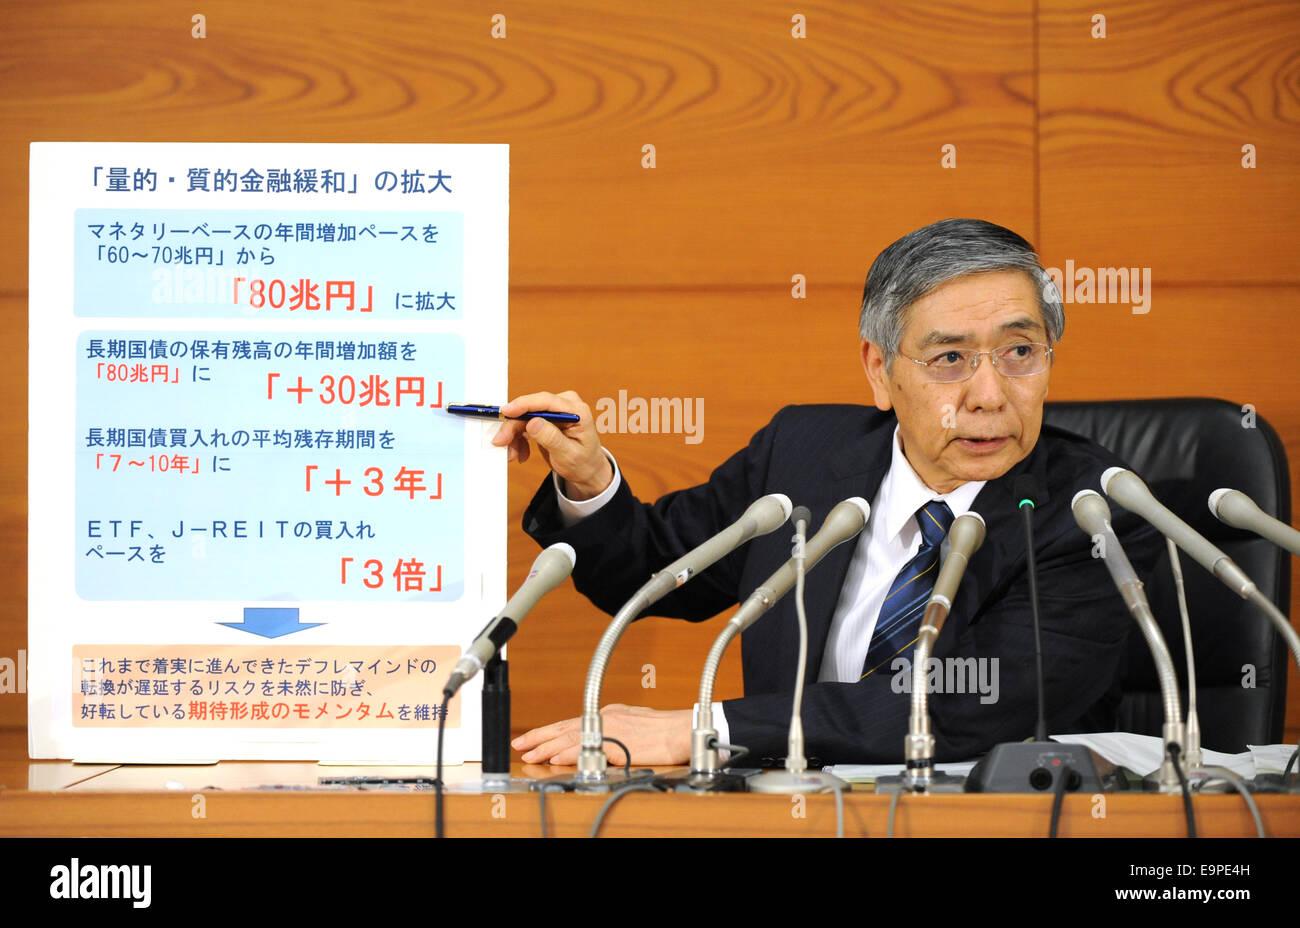 Tokyo, Japan. 31st Oct, 2014. Haruhiko Kuroda, governor of the Bank of Japan (BOJ), attends a press conference at - Stock Image